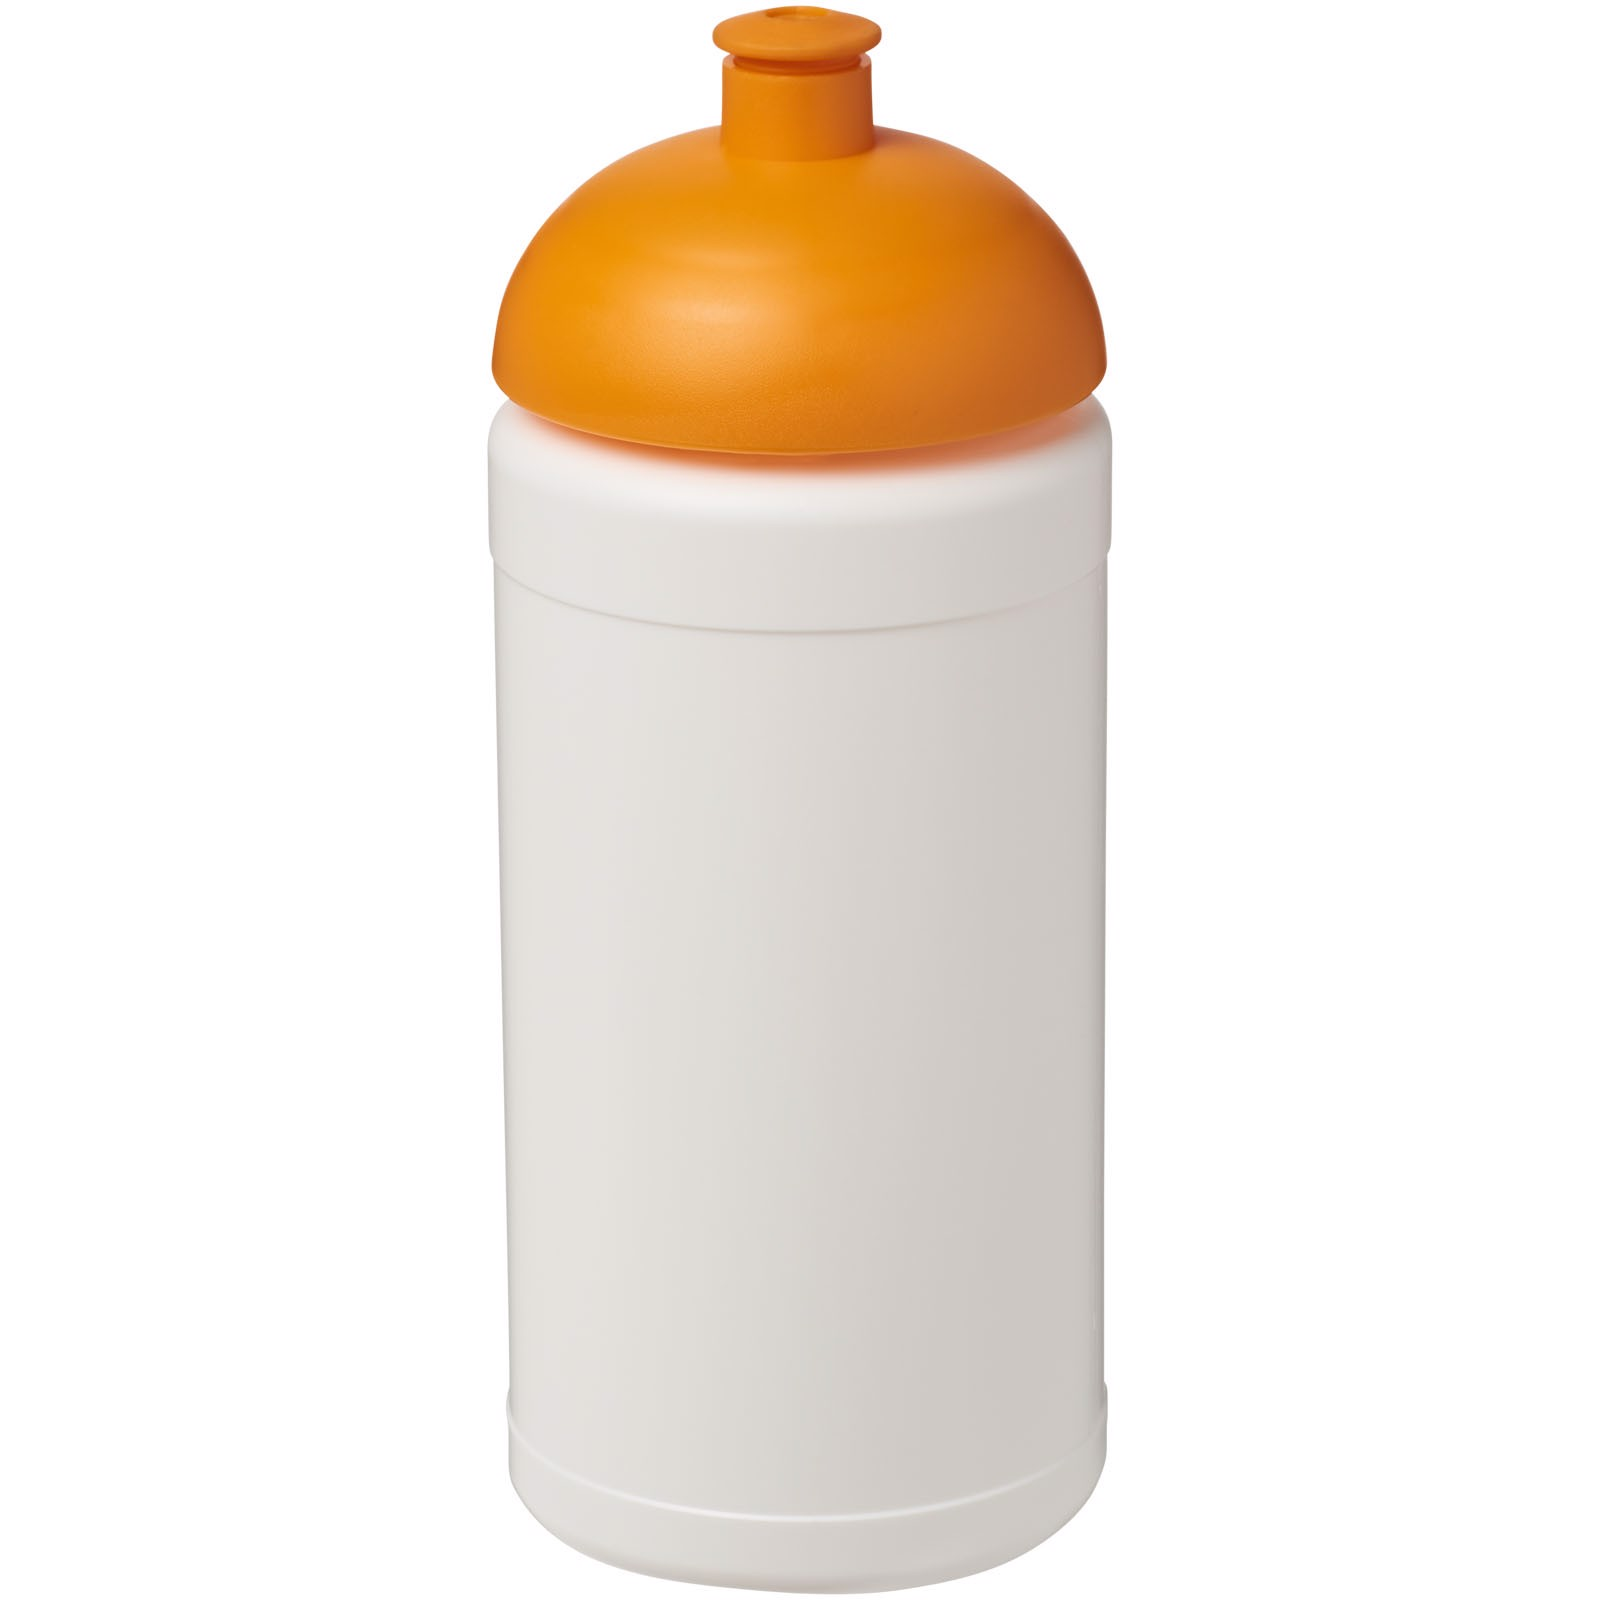 Baseline® Plus 500 ml dome lid sport bottle - White / Orange